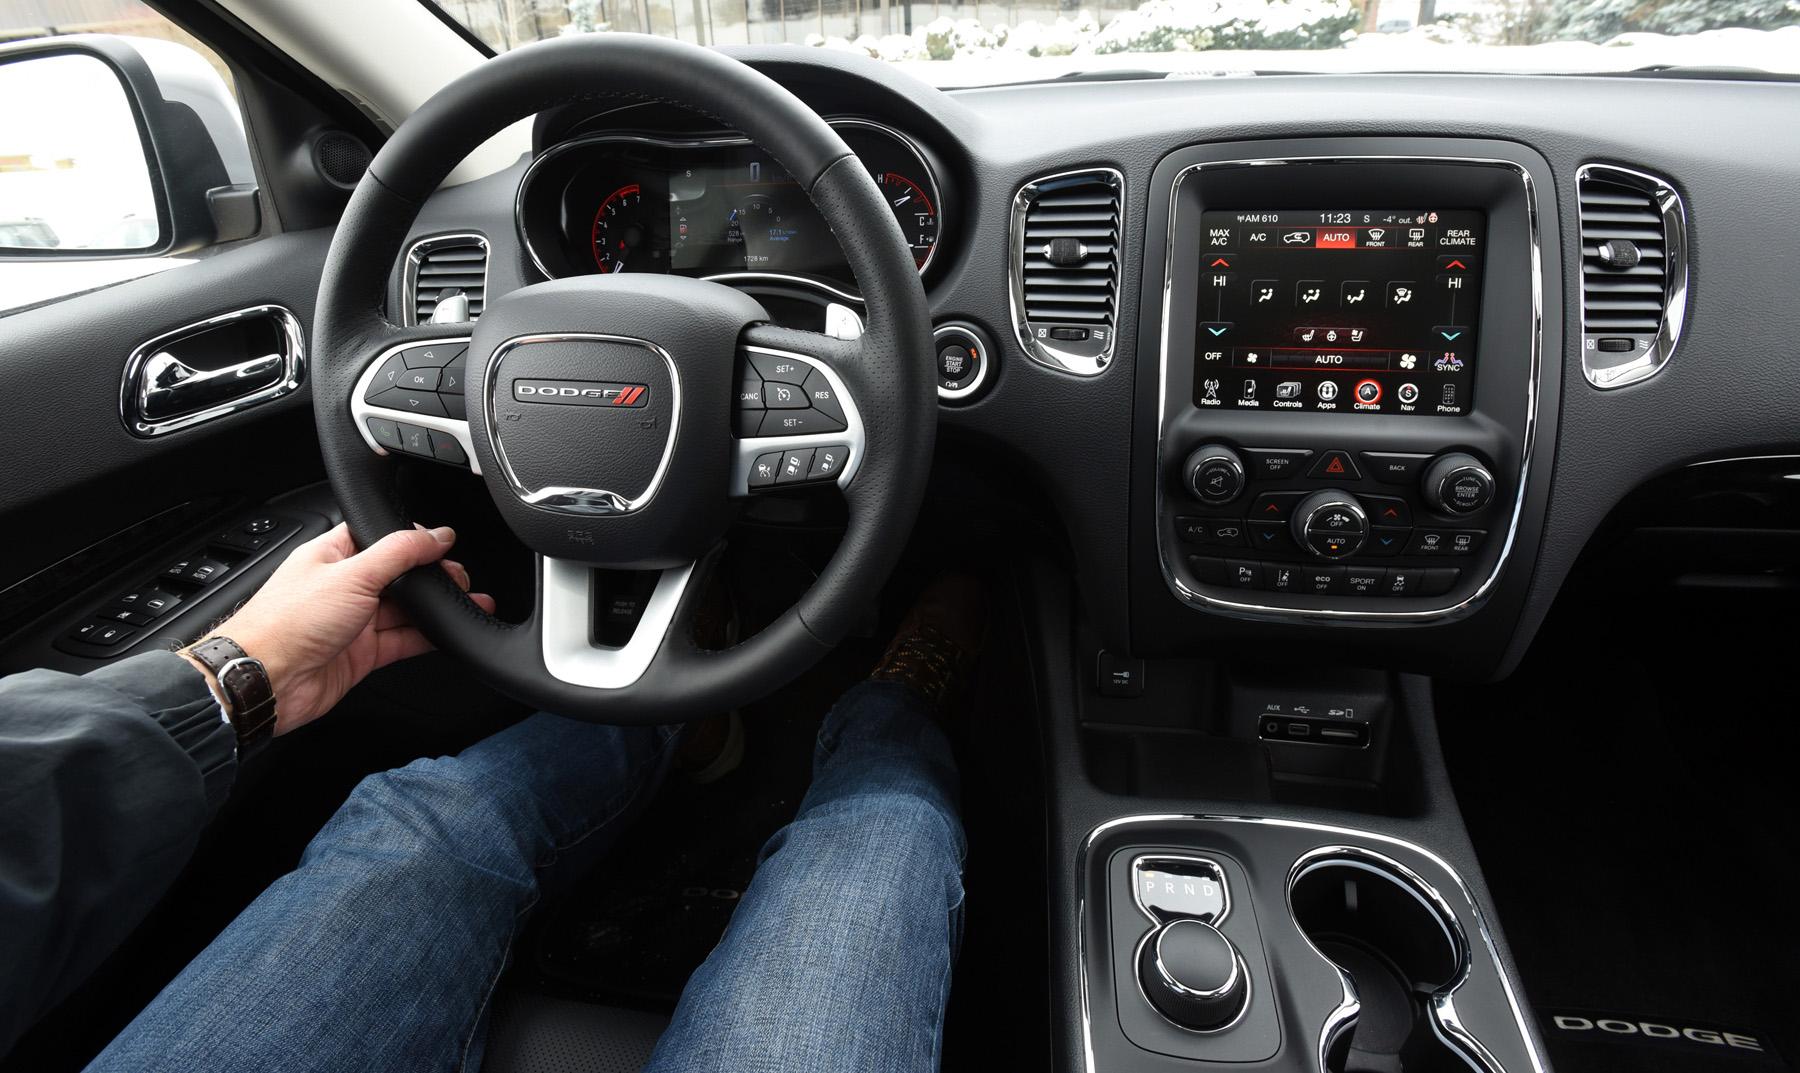 100 Dodge Durango Interior 2016 Jeep Grand Cherokee Dodge Durango Led Interior How To